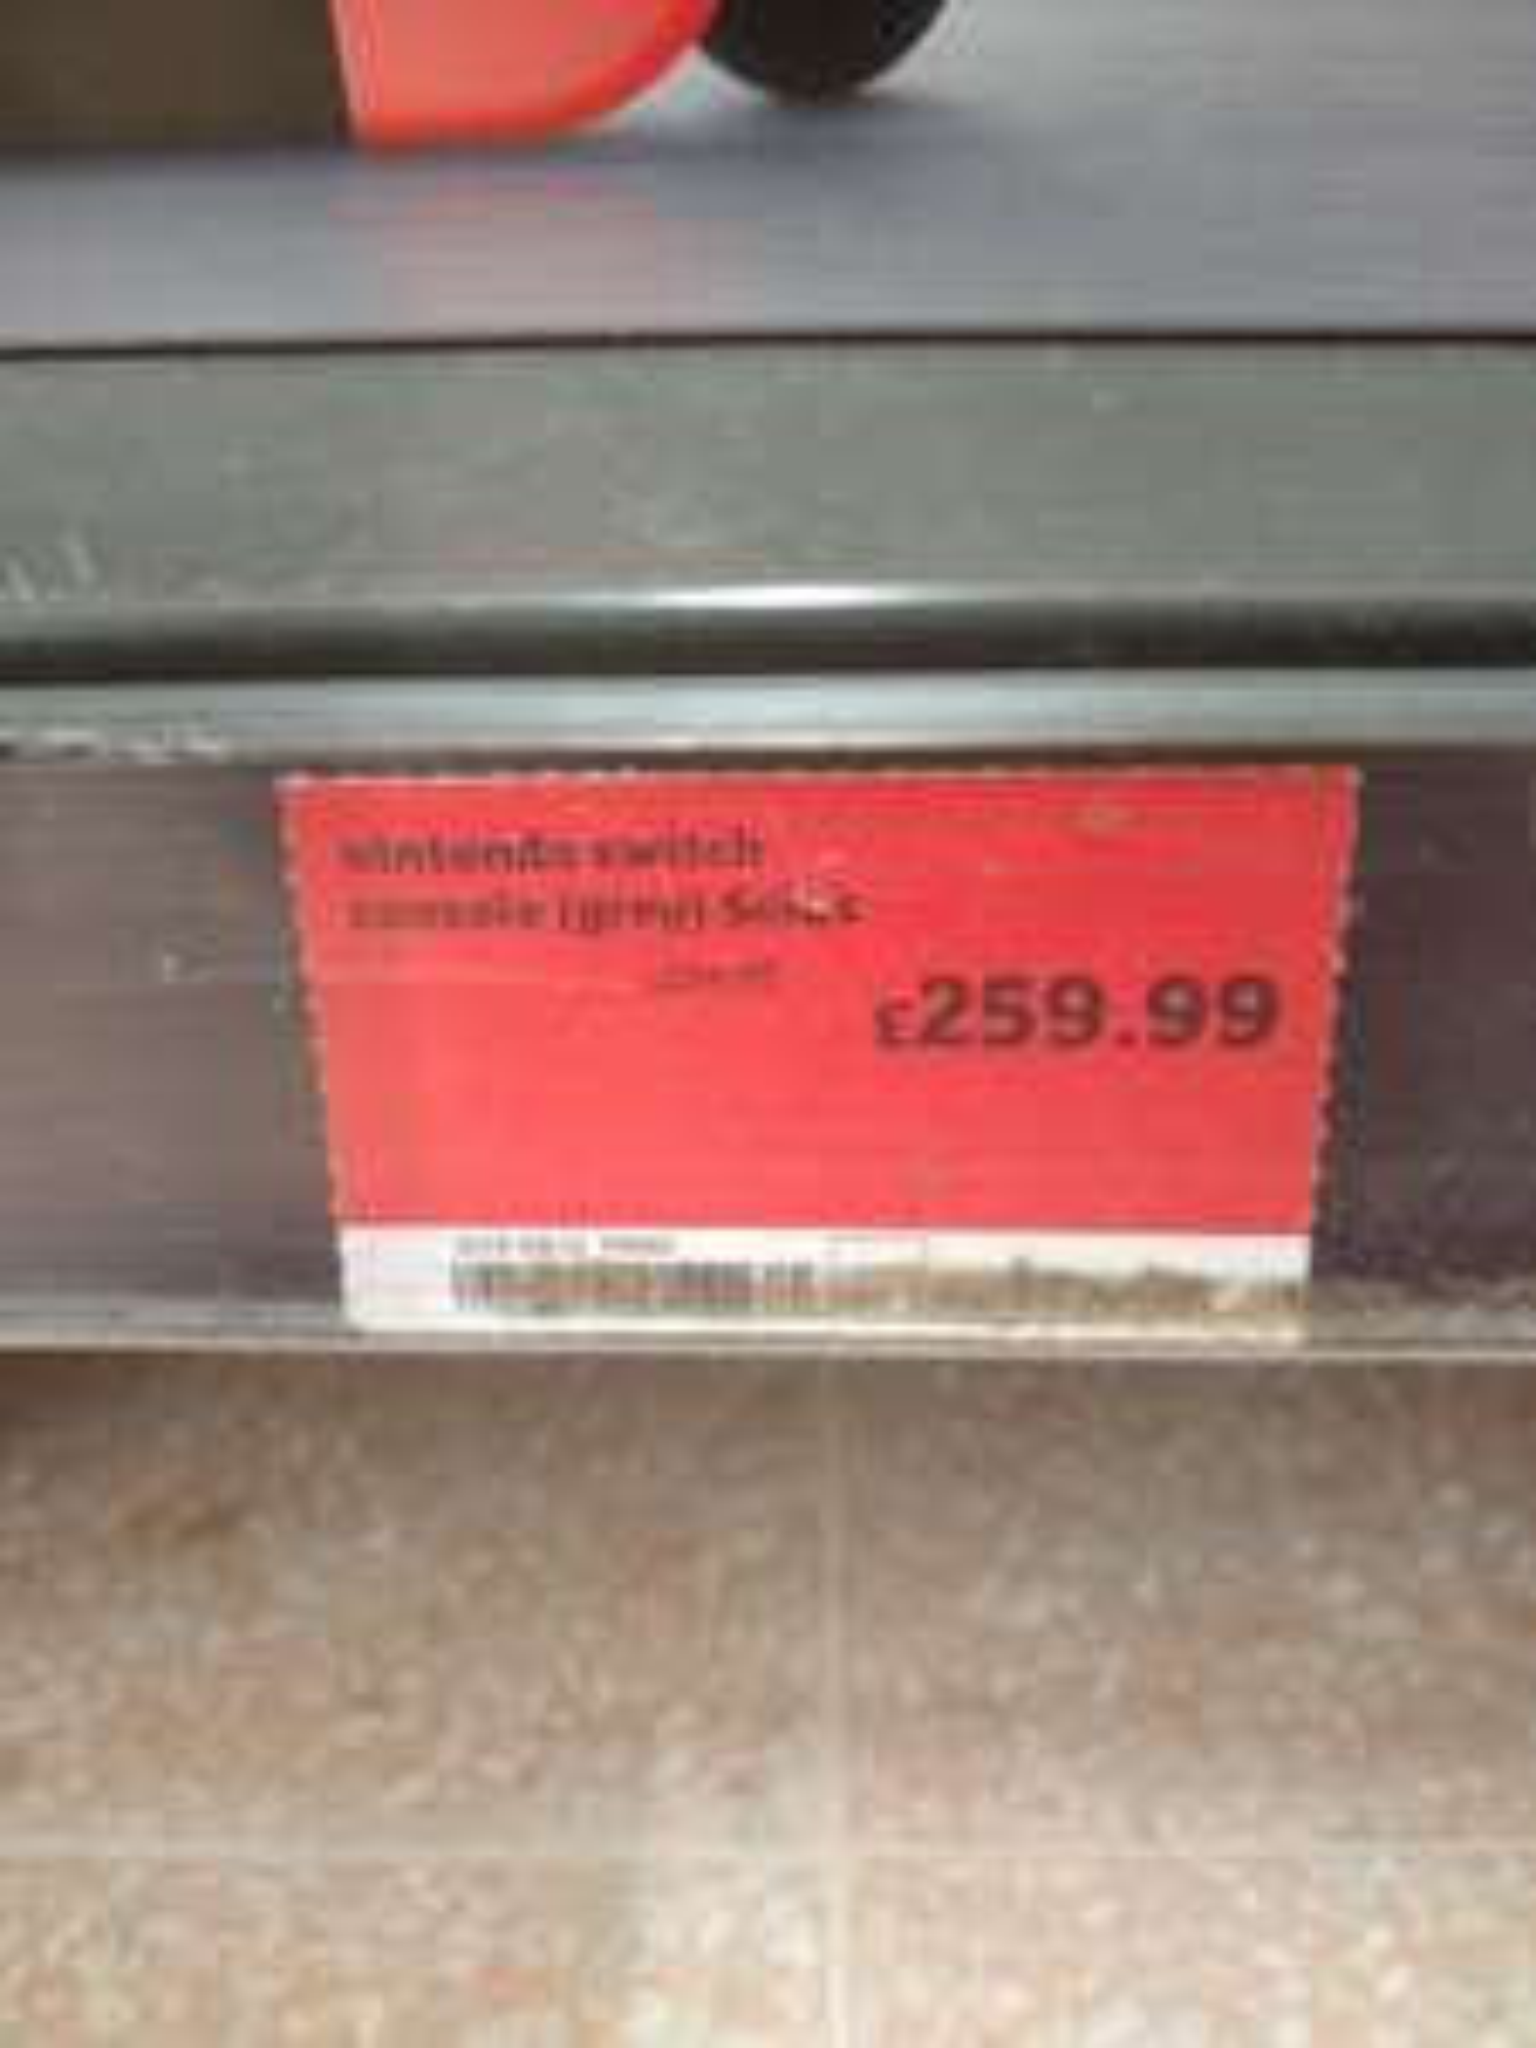 Nintendo Switch Grey £259.99 at Sainsburys instore